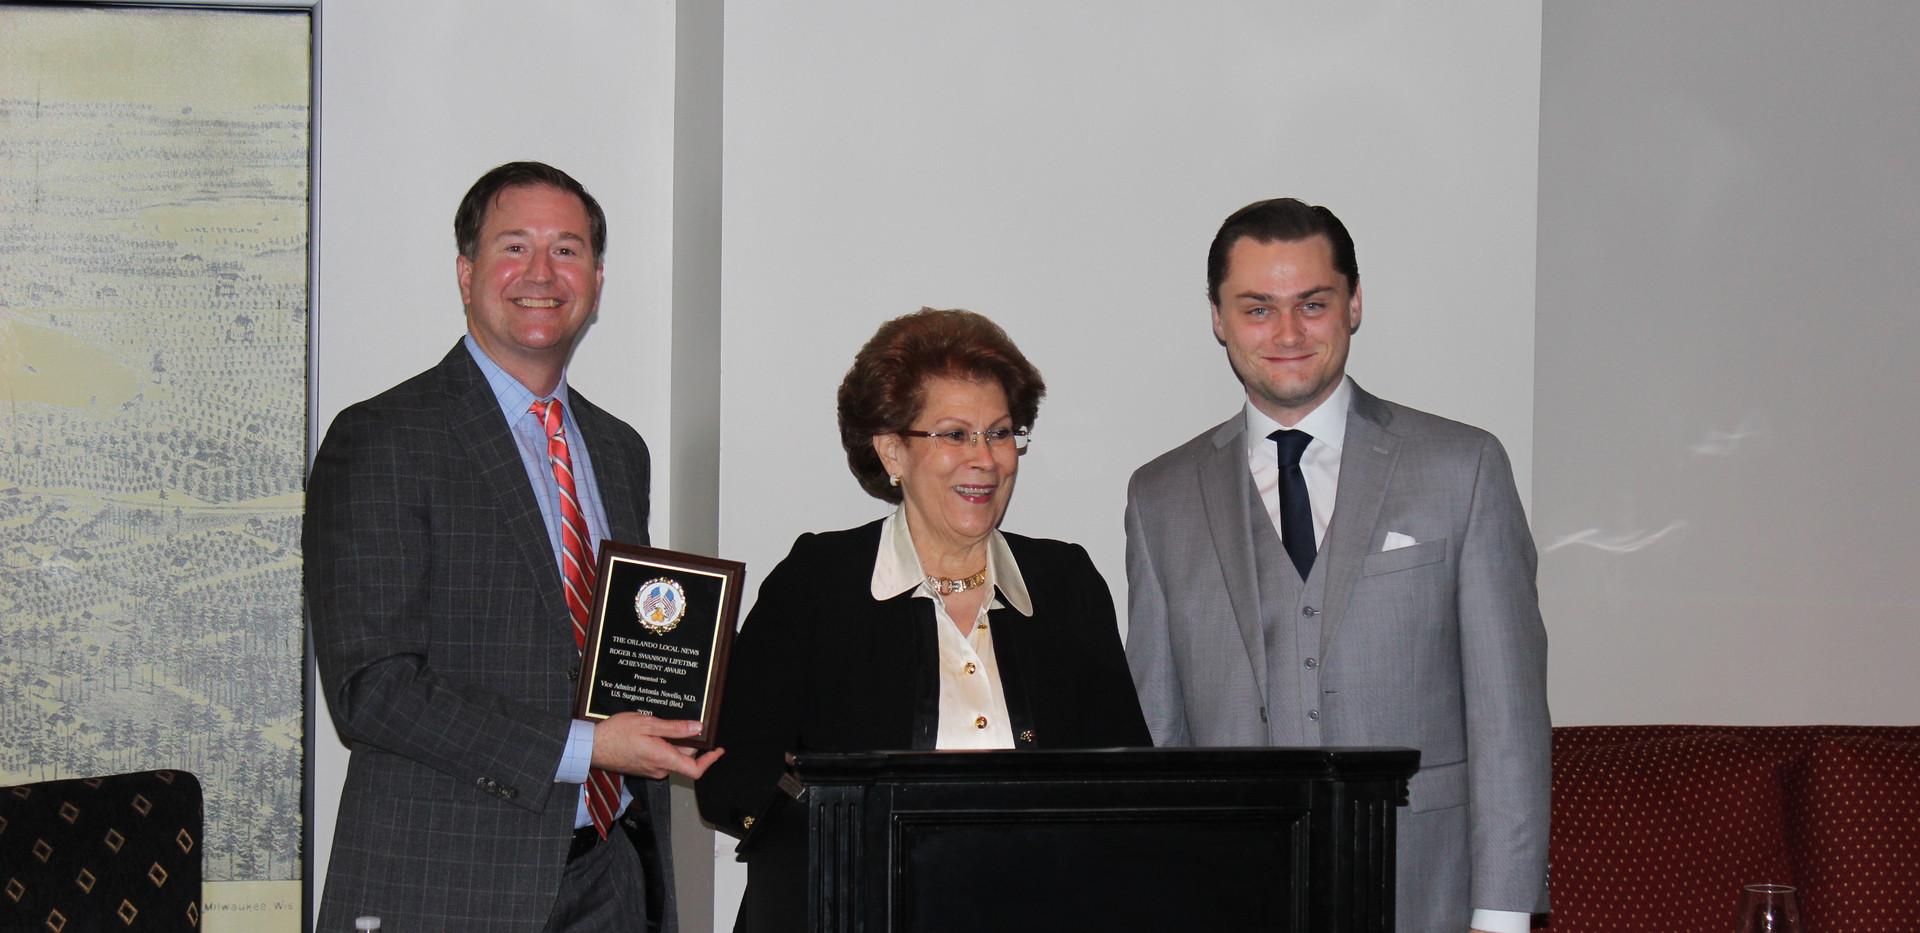 Francisco Gonzalez, Antonia Novello, Marshall Swanson